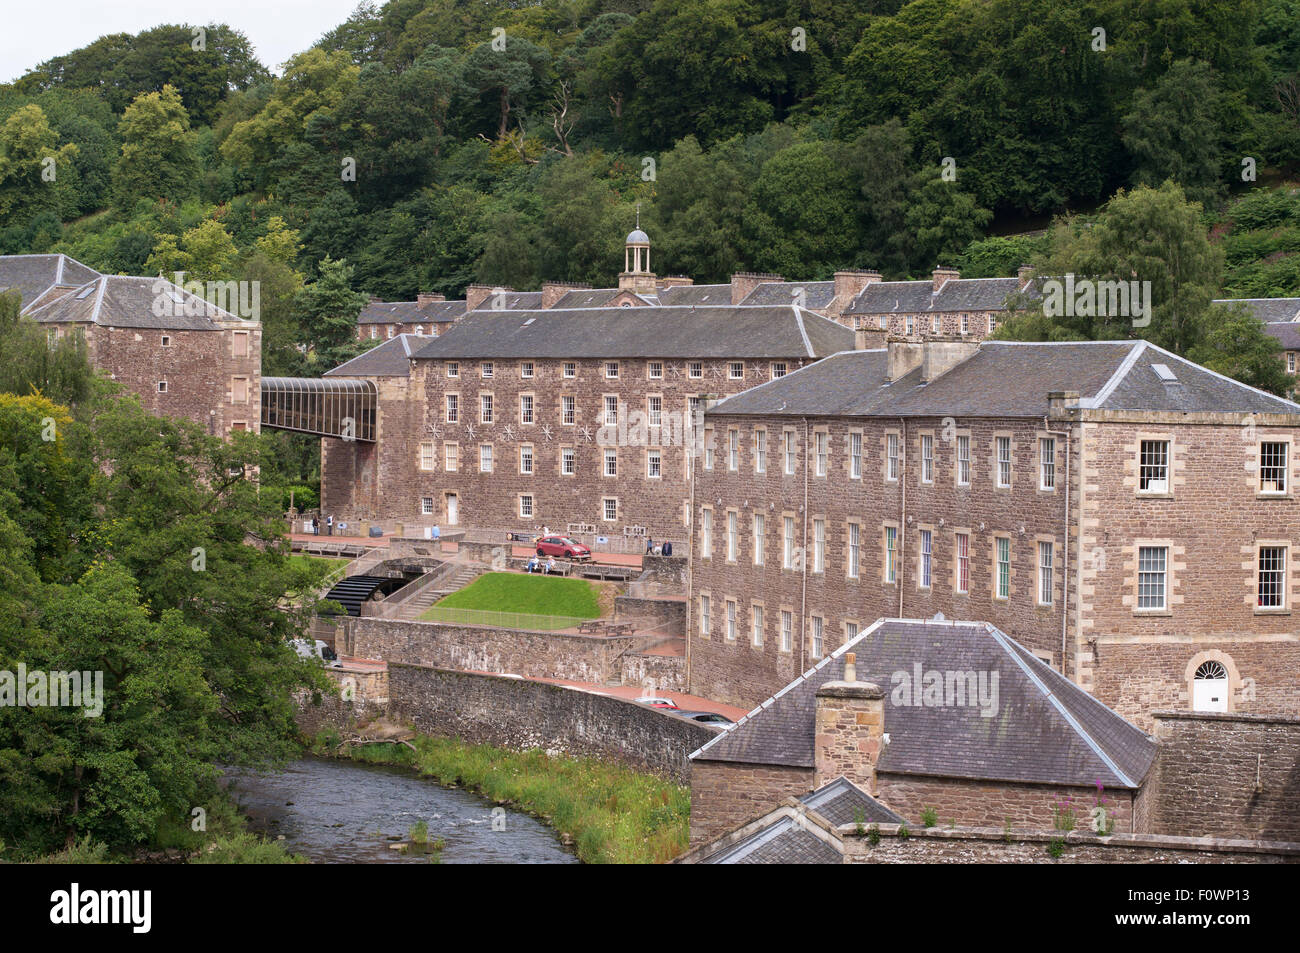 New Lanark Mills, World Heritage Site, Lanark, South Lanarkshire, Scotland, UK - Stock Image